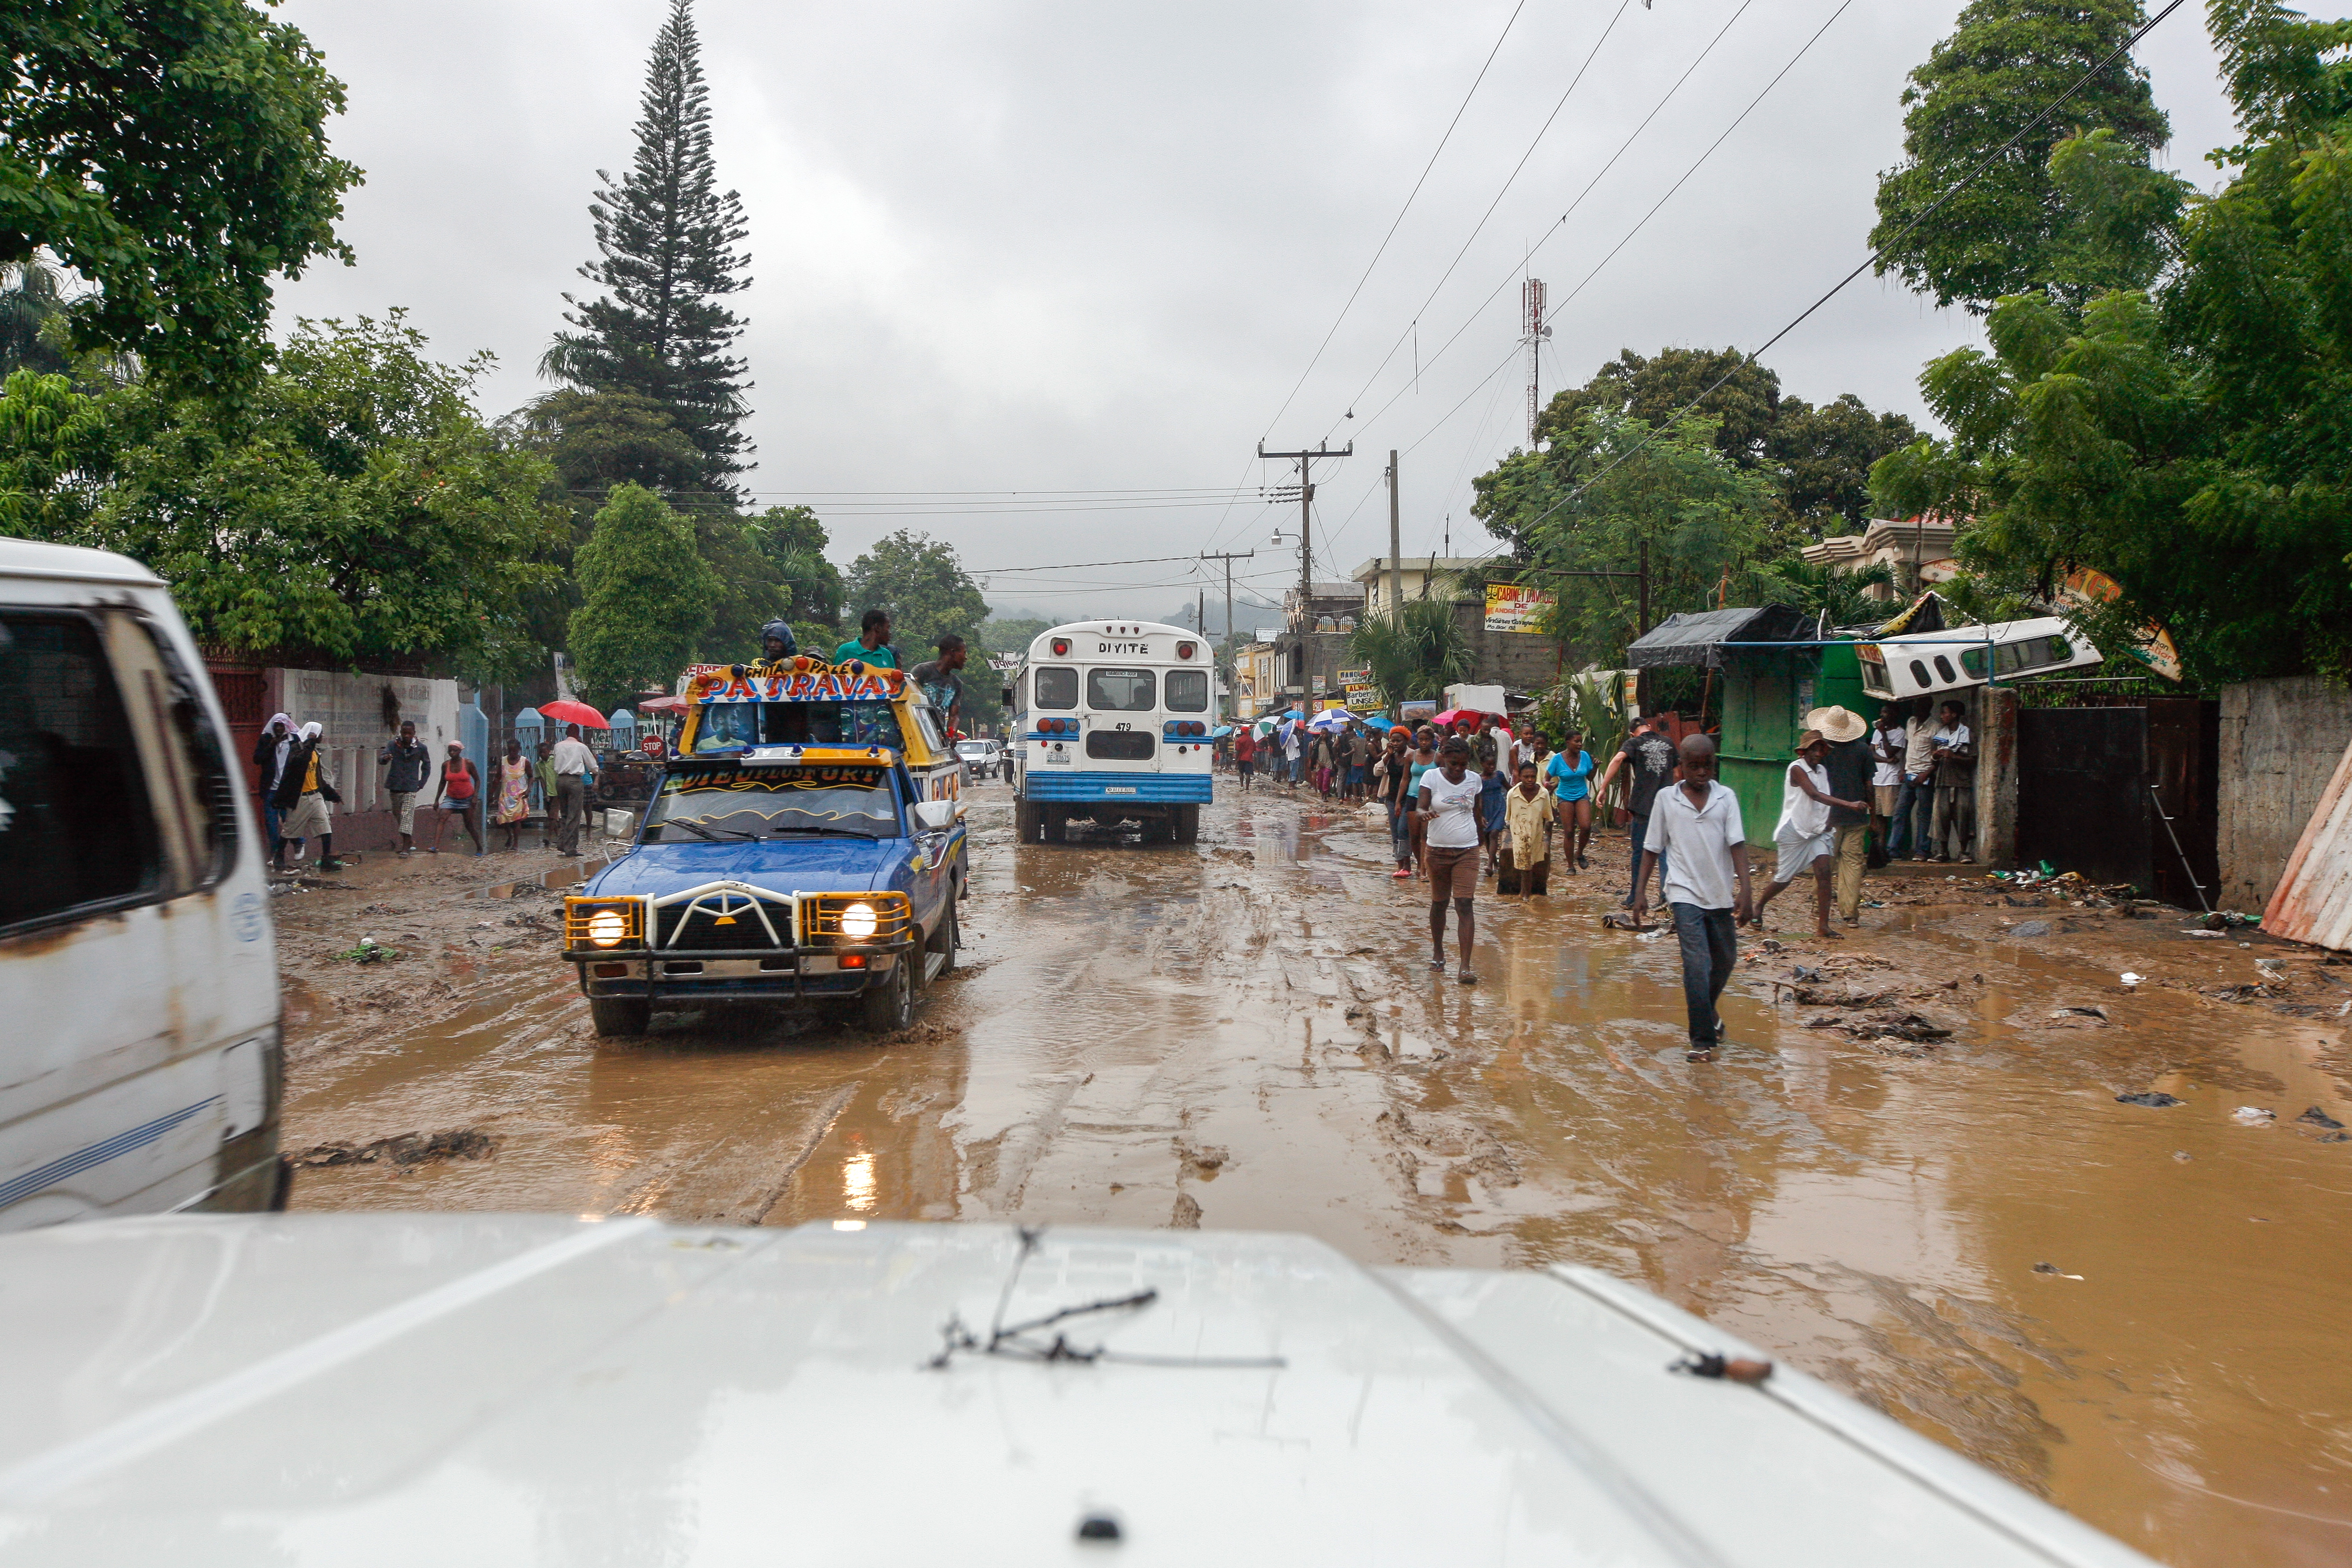 filethe main street in cap haitien haiti 8169680065